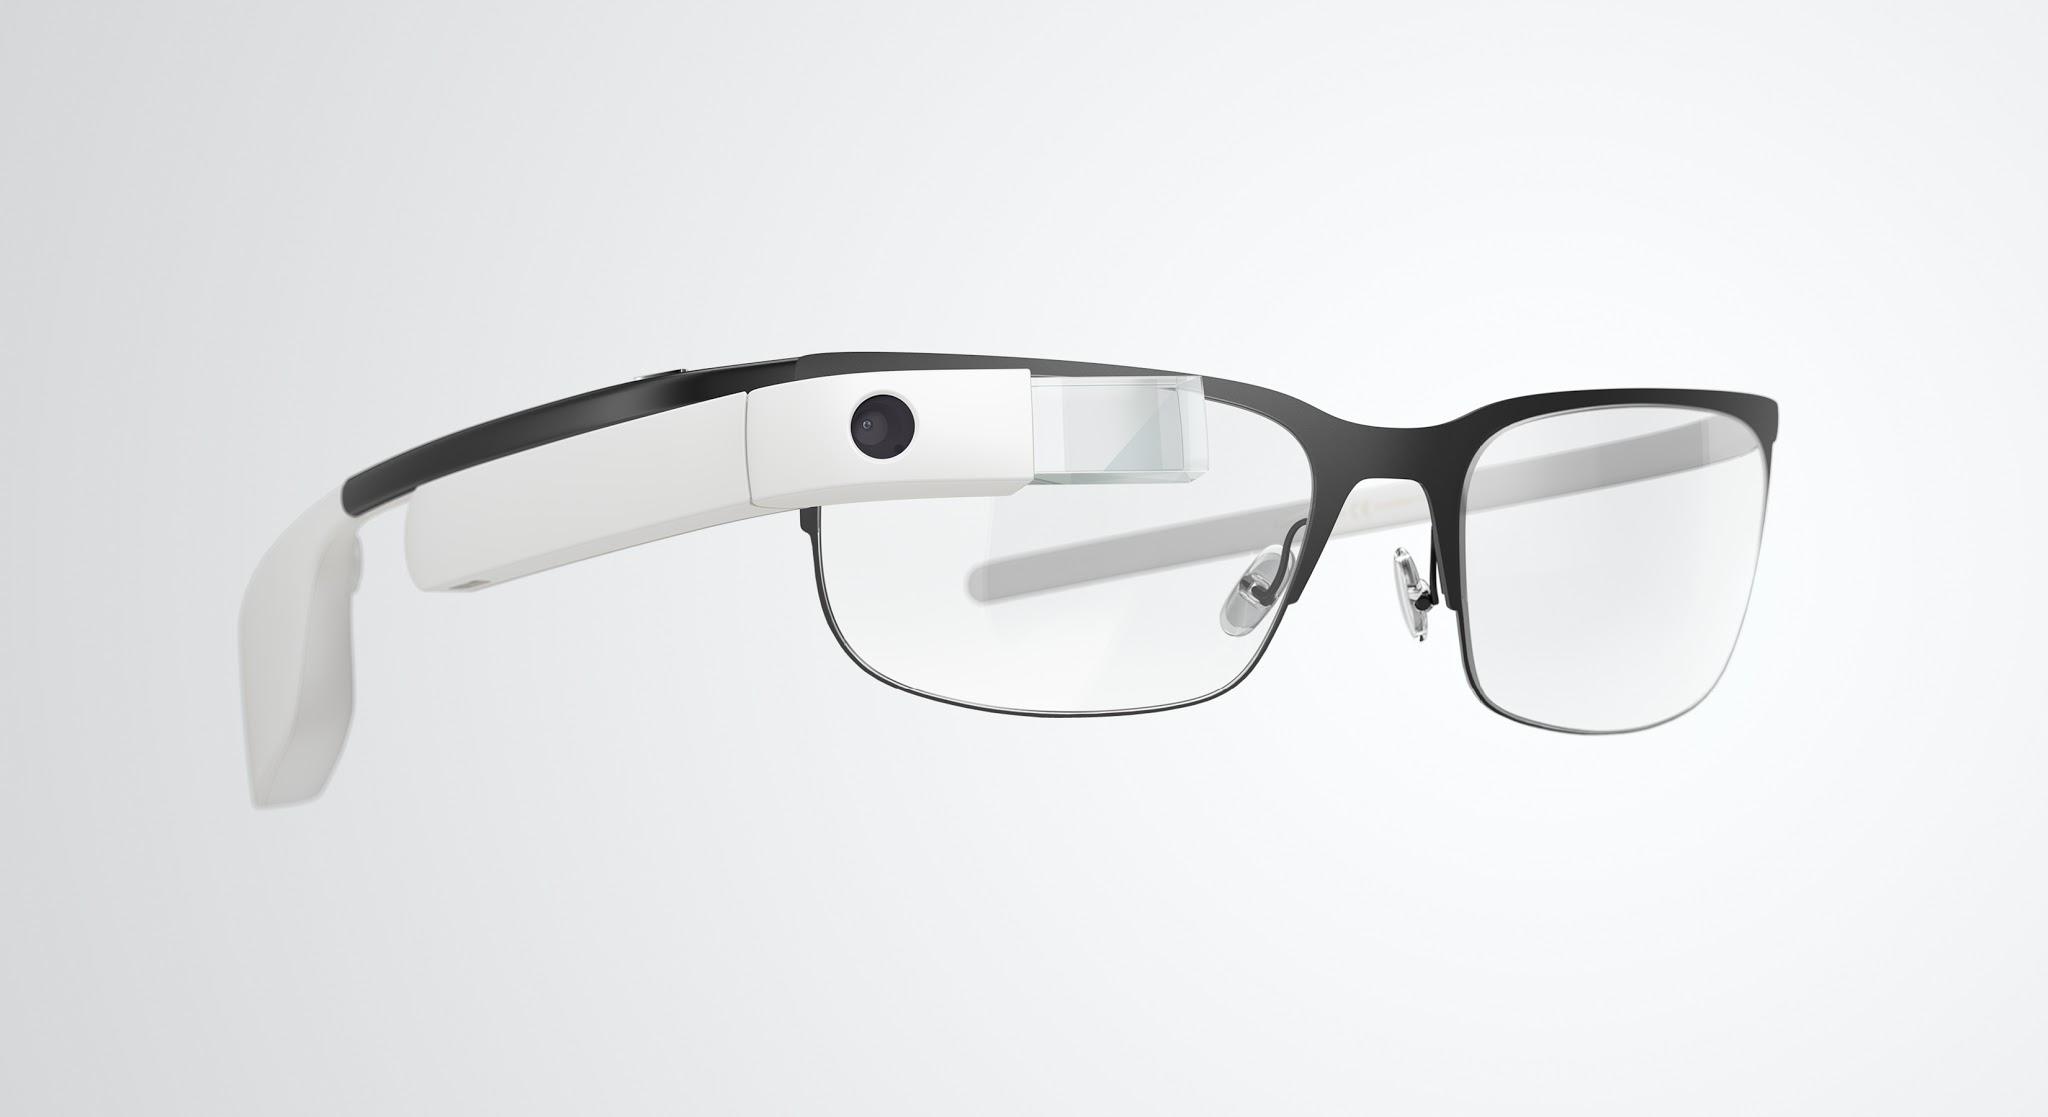 07113280-photo-google-glass-monture